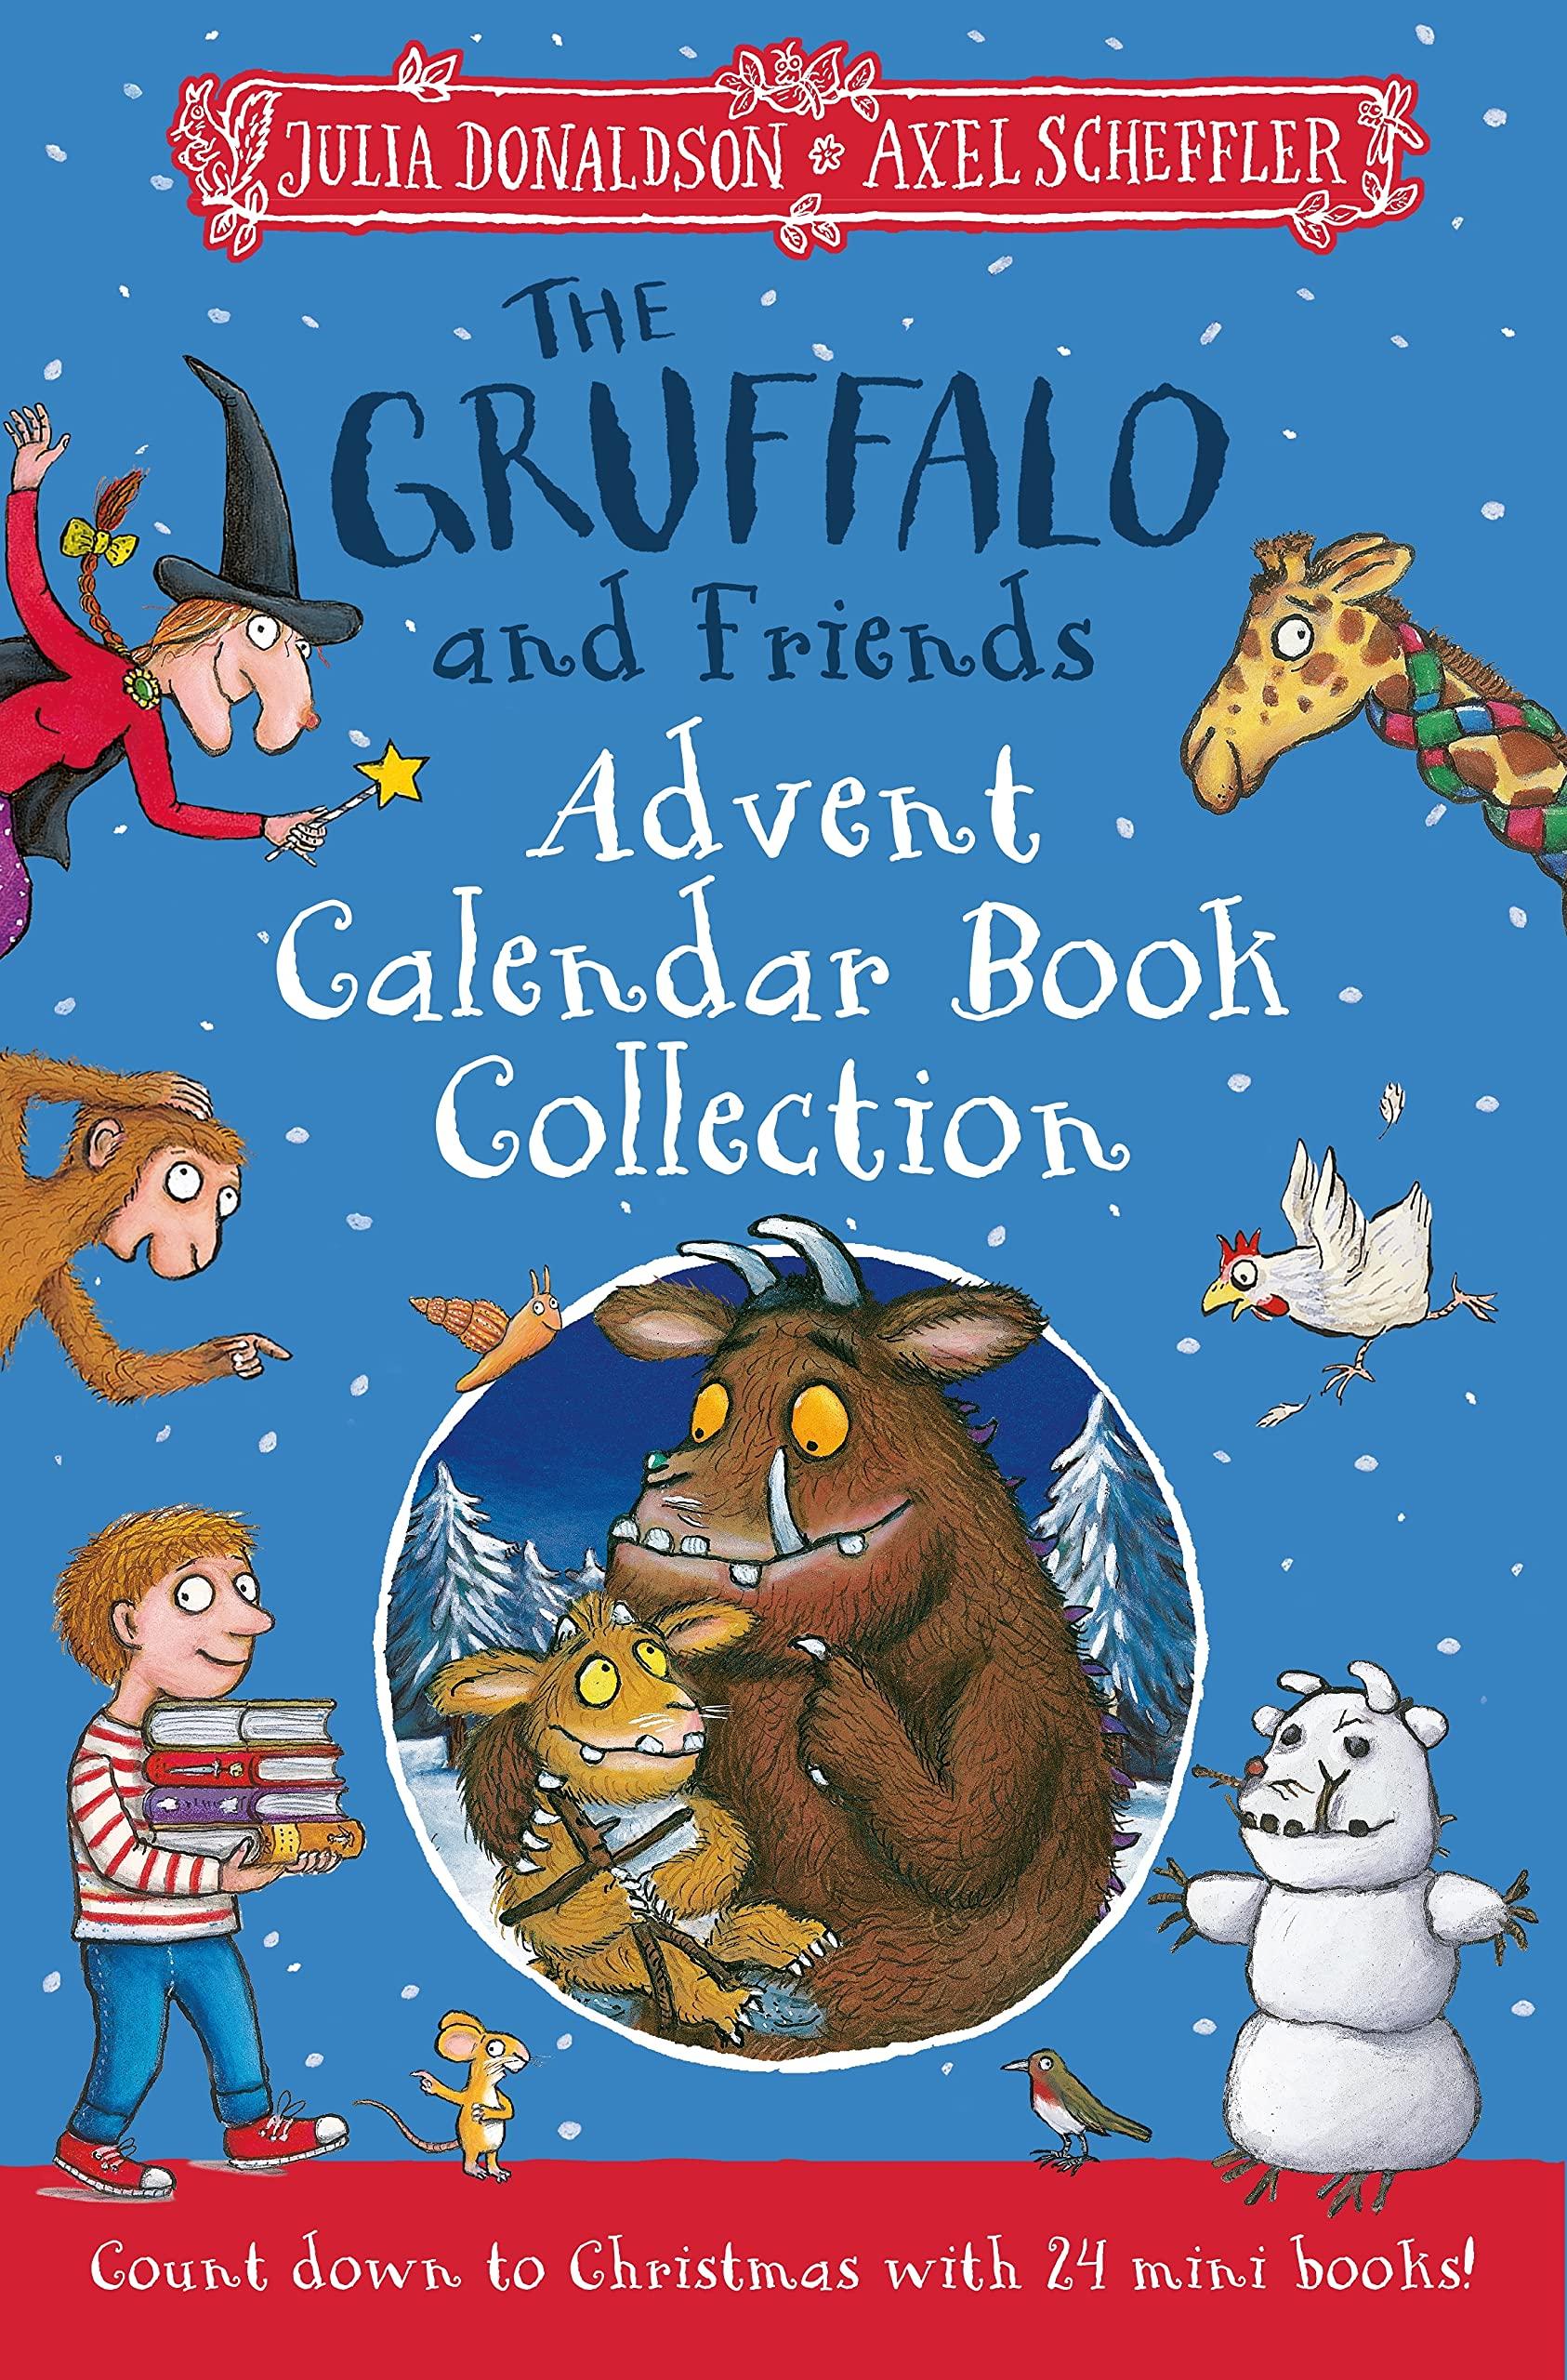 The Gruffalo and Friends Advent Calendar